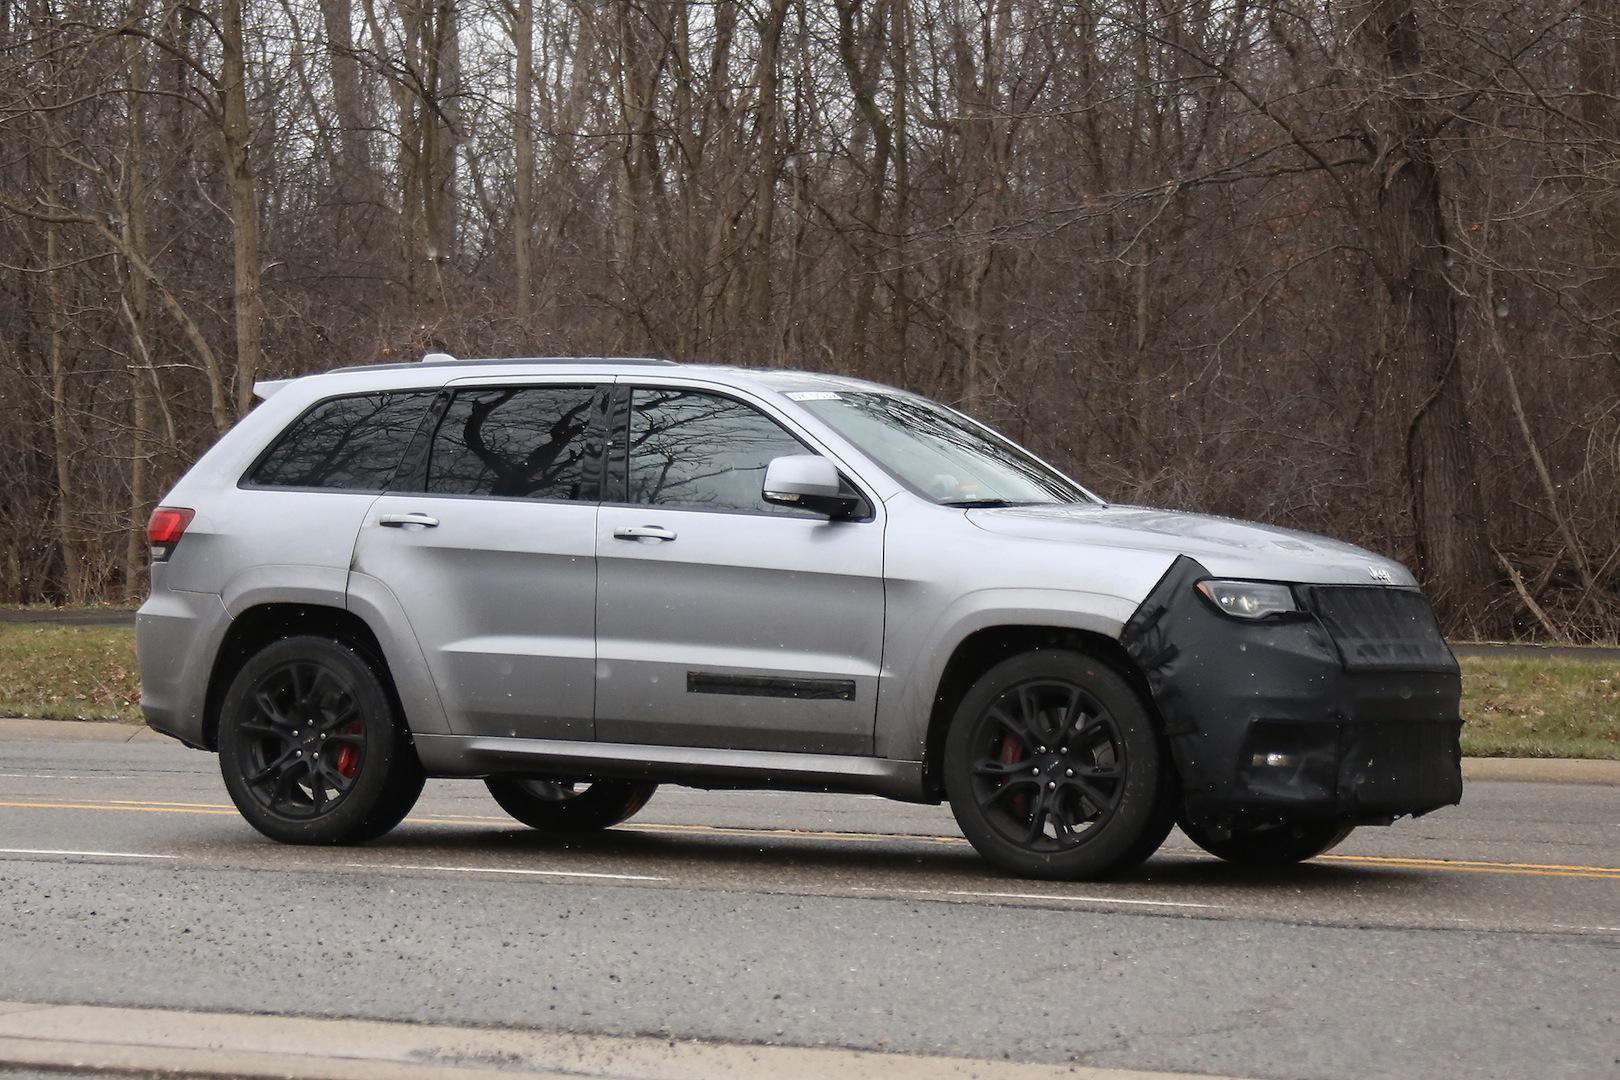 Dodge Hellcat For Sale >> Jeep Grand Cherokee Hellcat Latest Spy Shots - GTspirit